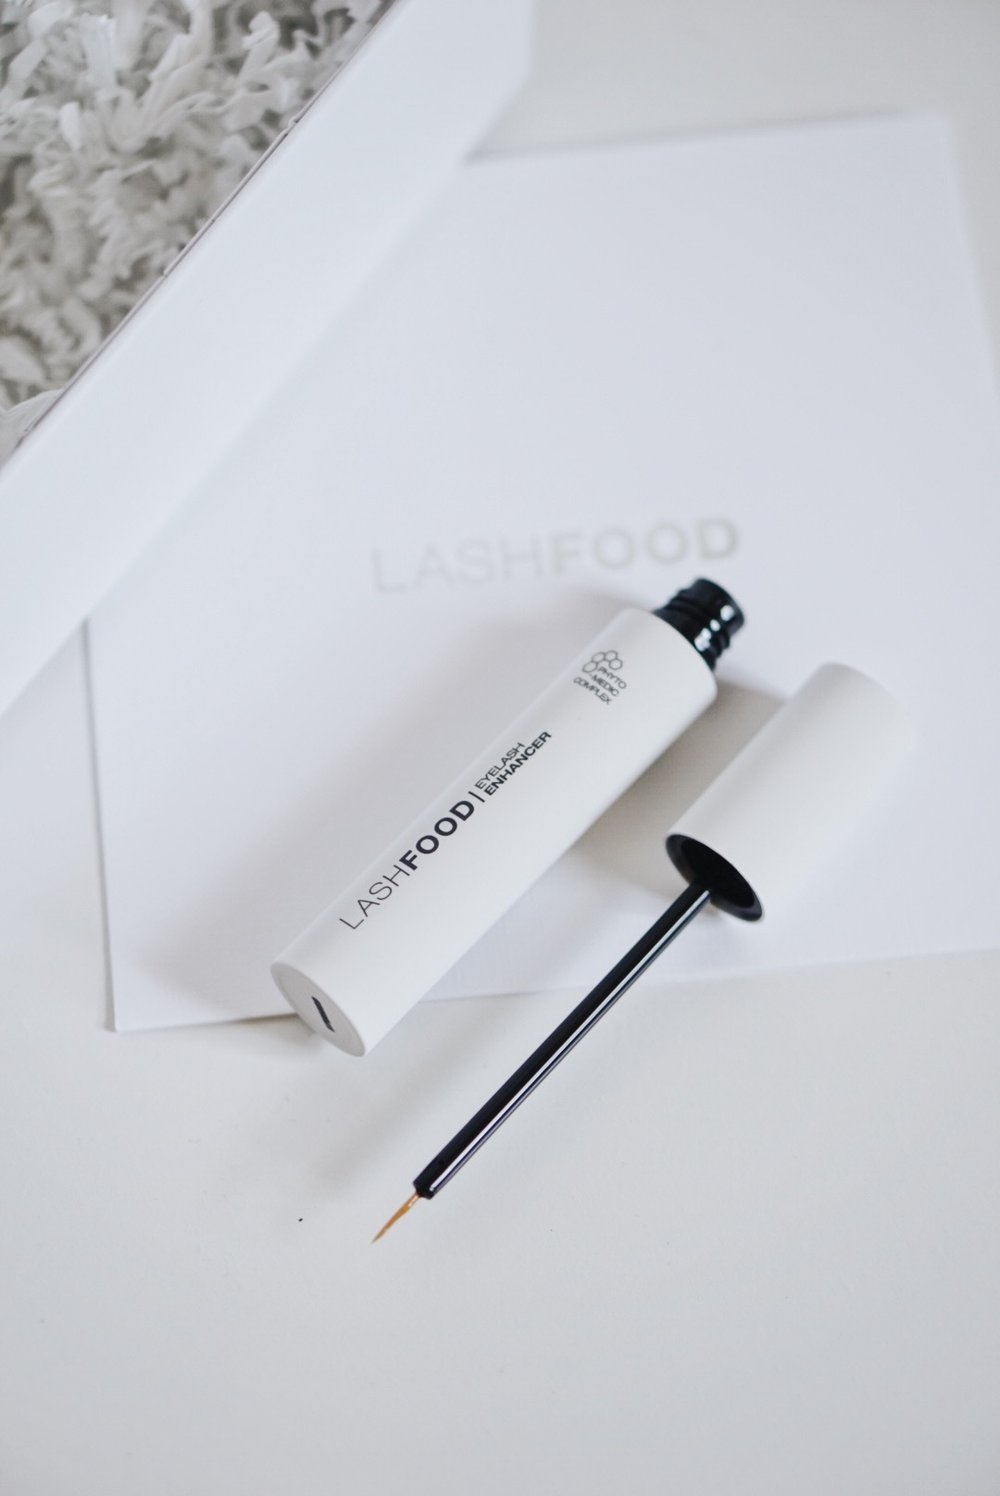 Lash-Extensions-LashFood-Eyelash-Enhancer-Review-Thoughts